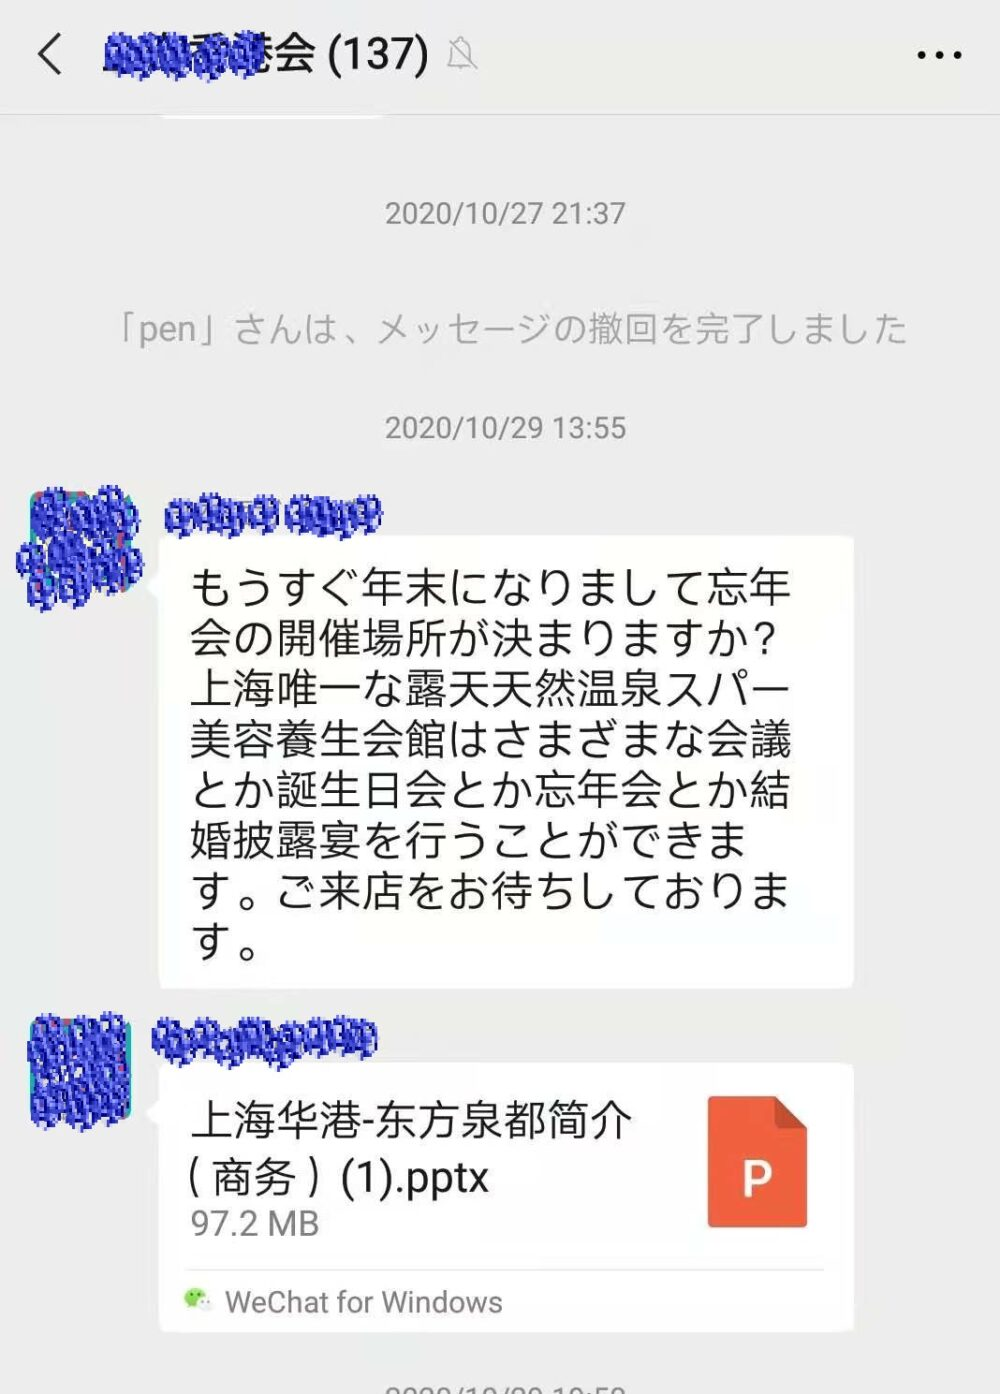 WeChatのグループチャット内で中国人が営業を始める様子の写真